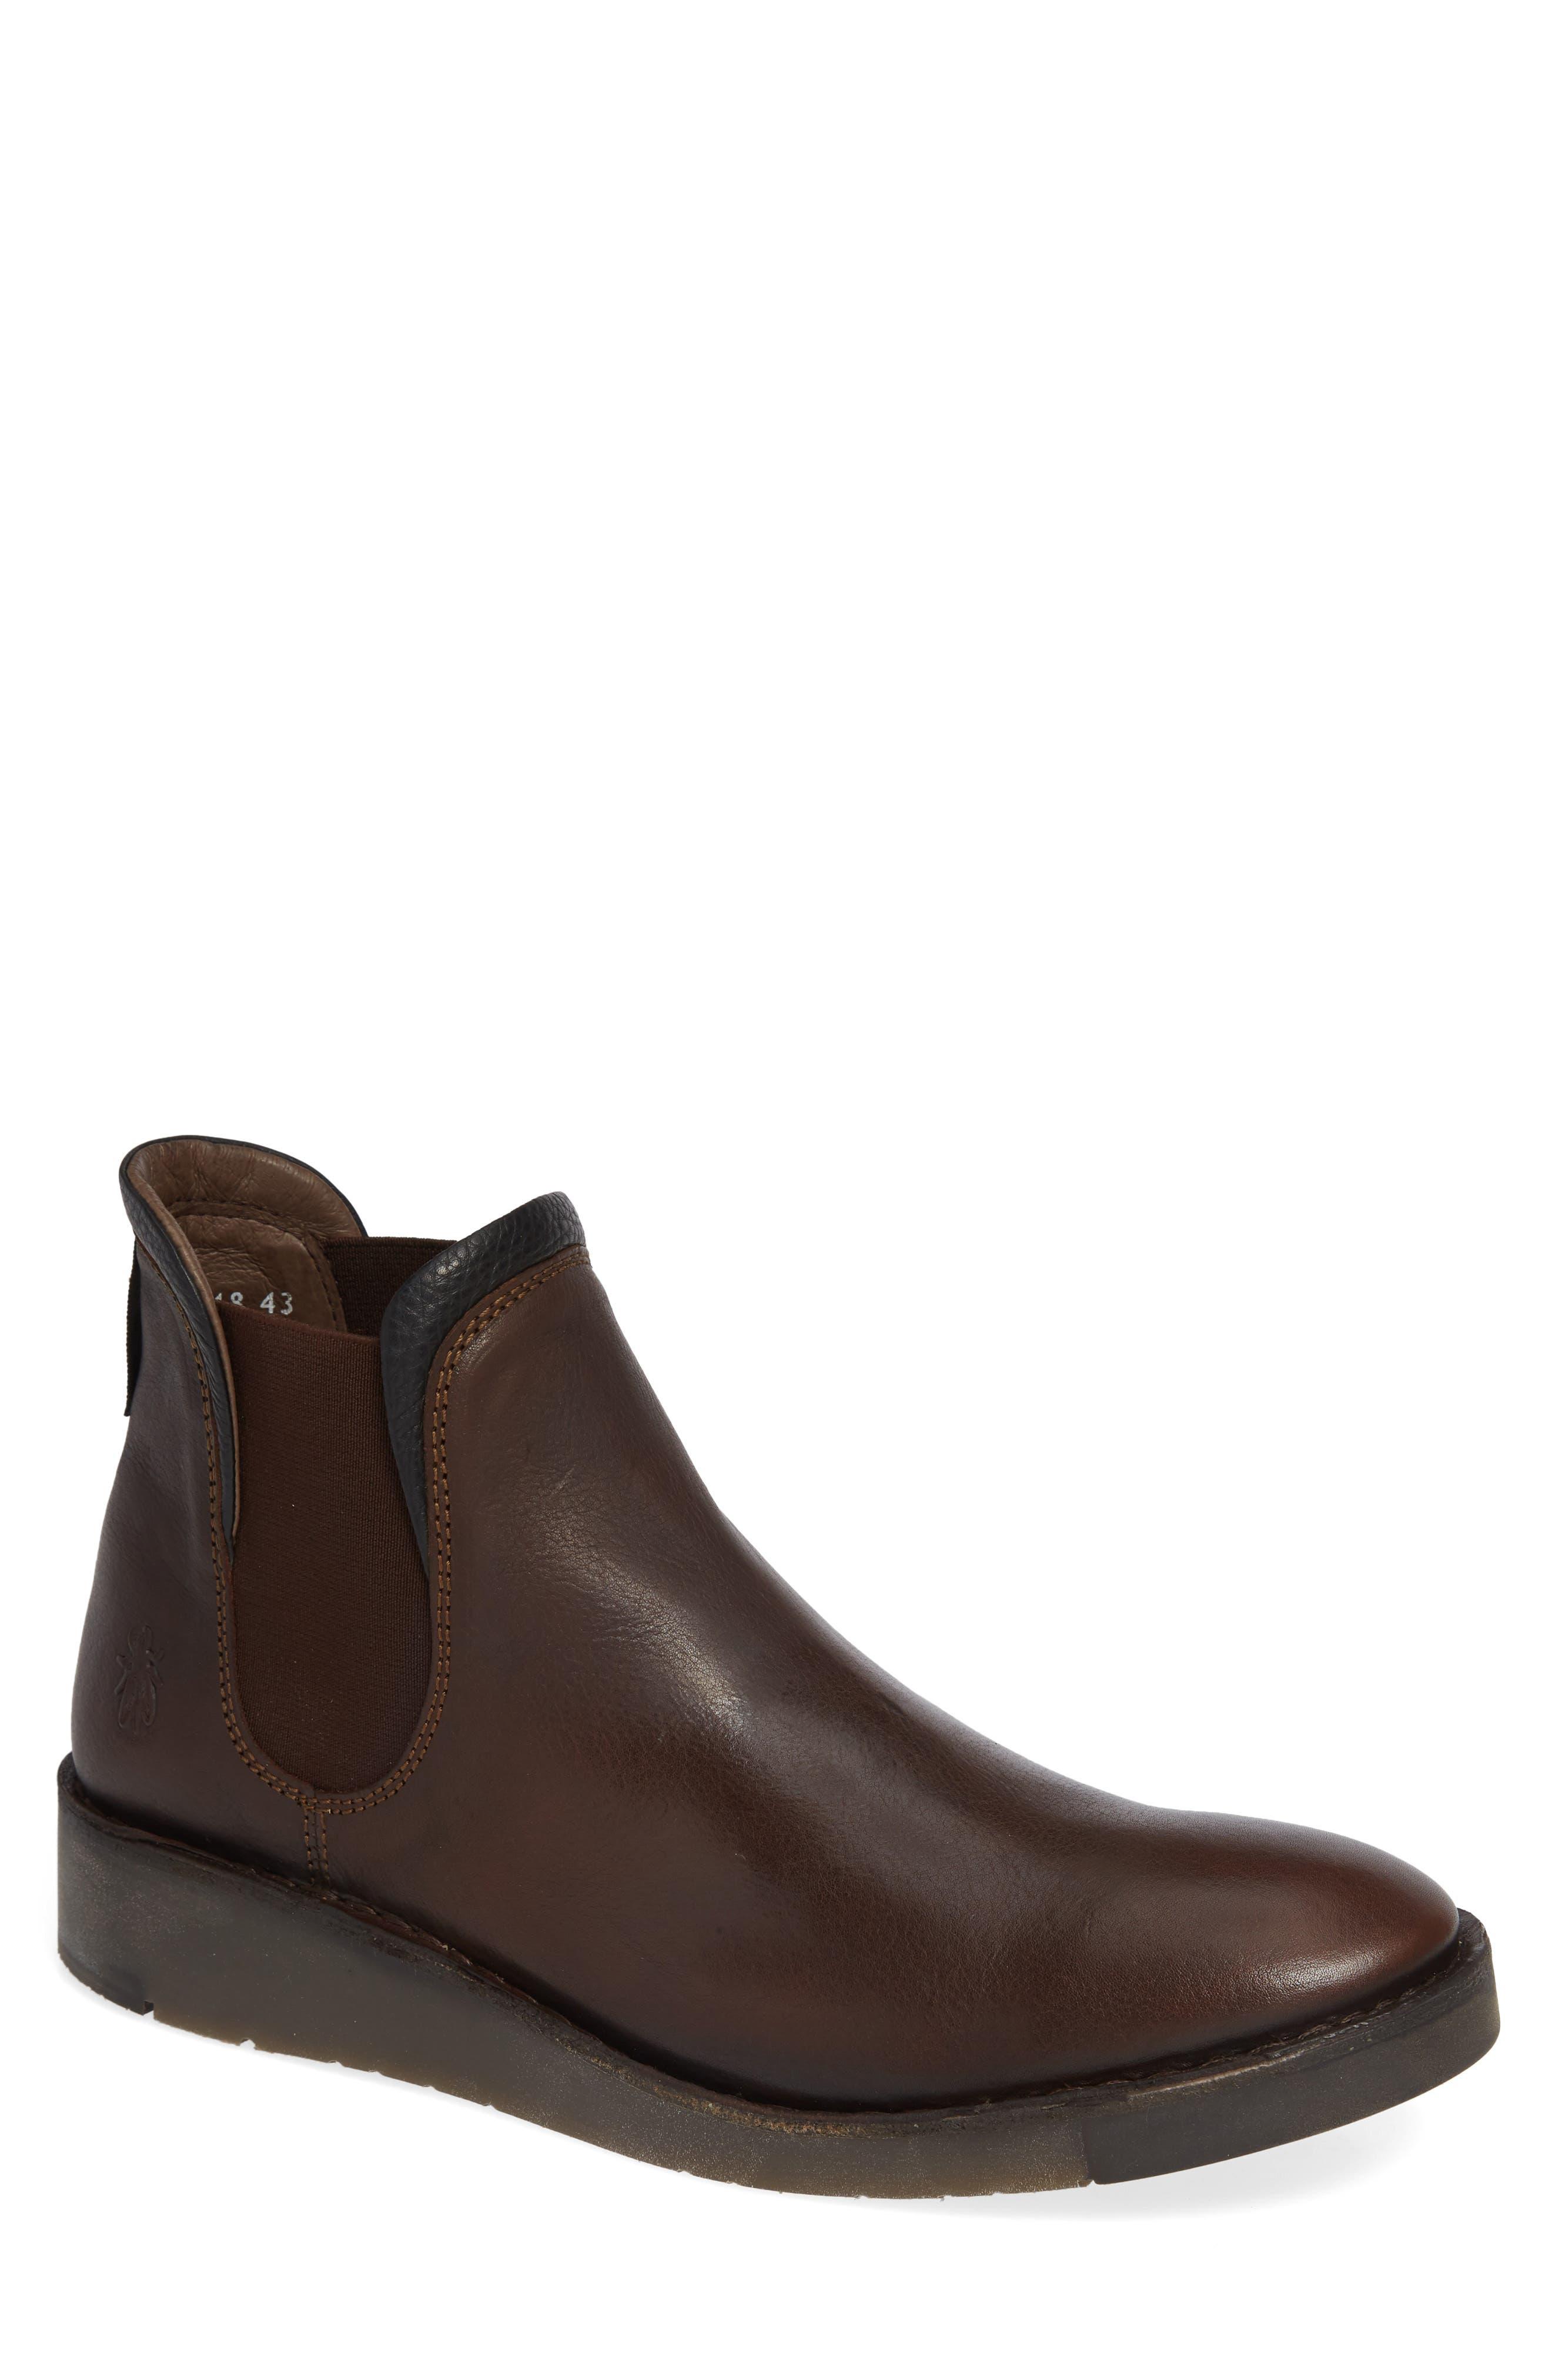 Sern Water Resistant Chelsea Boot,                         Main,                         color, Brown Apso